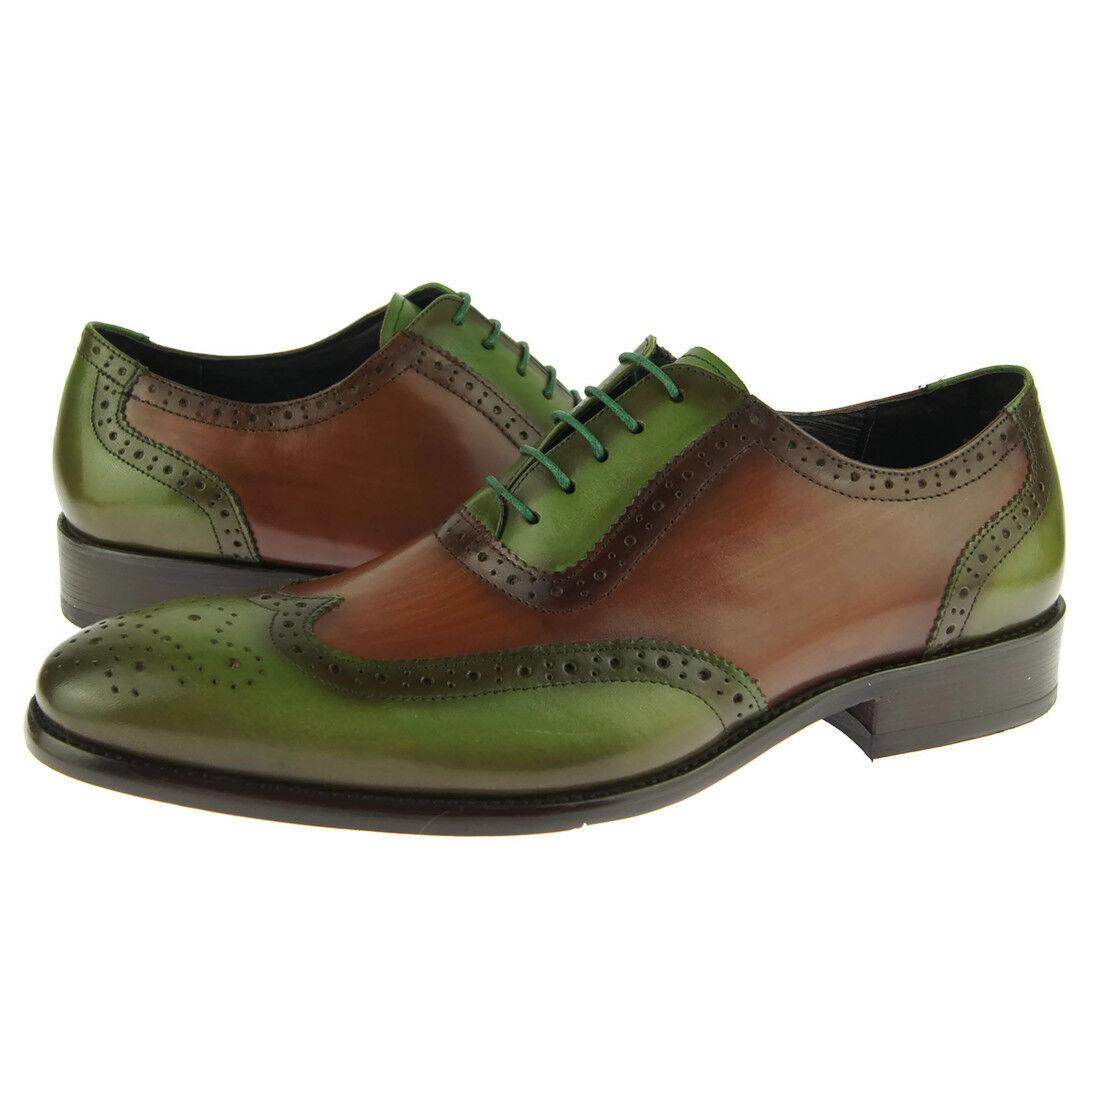 Carrucci Leder Wingtip Oxford, Herren Kleid Schuhe, Olive   braun